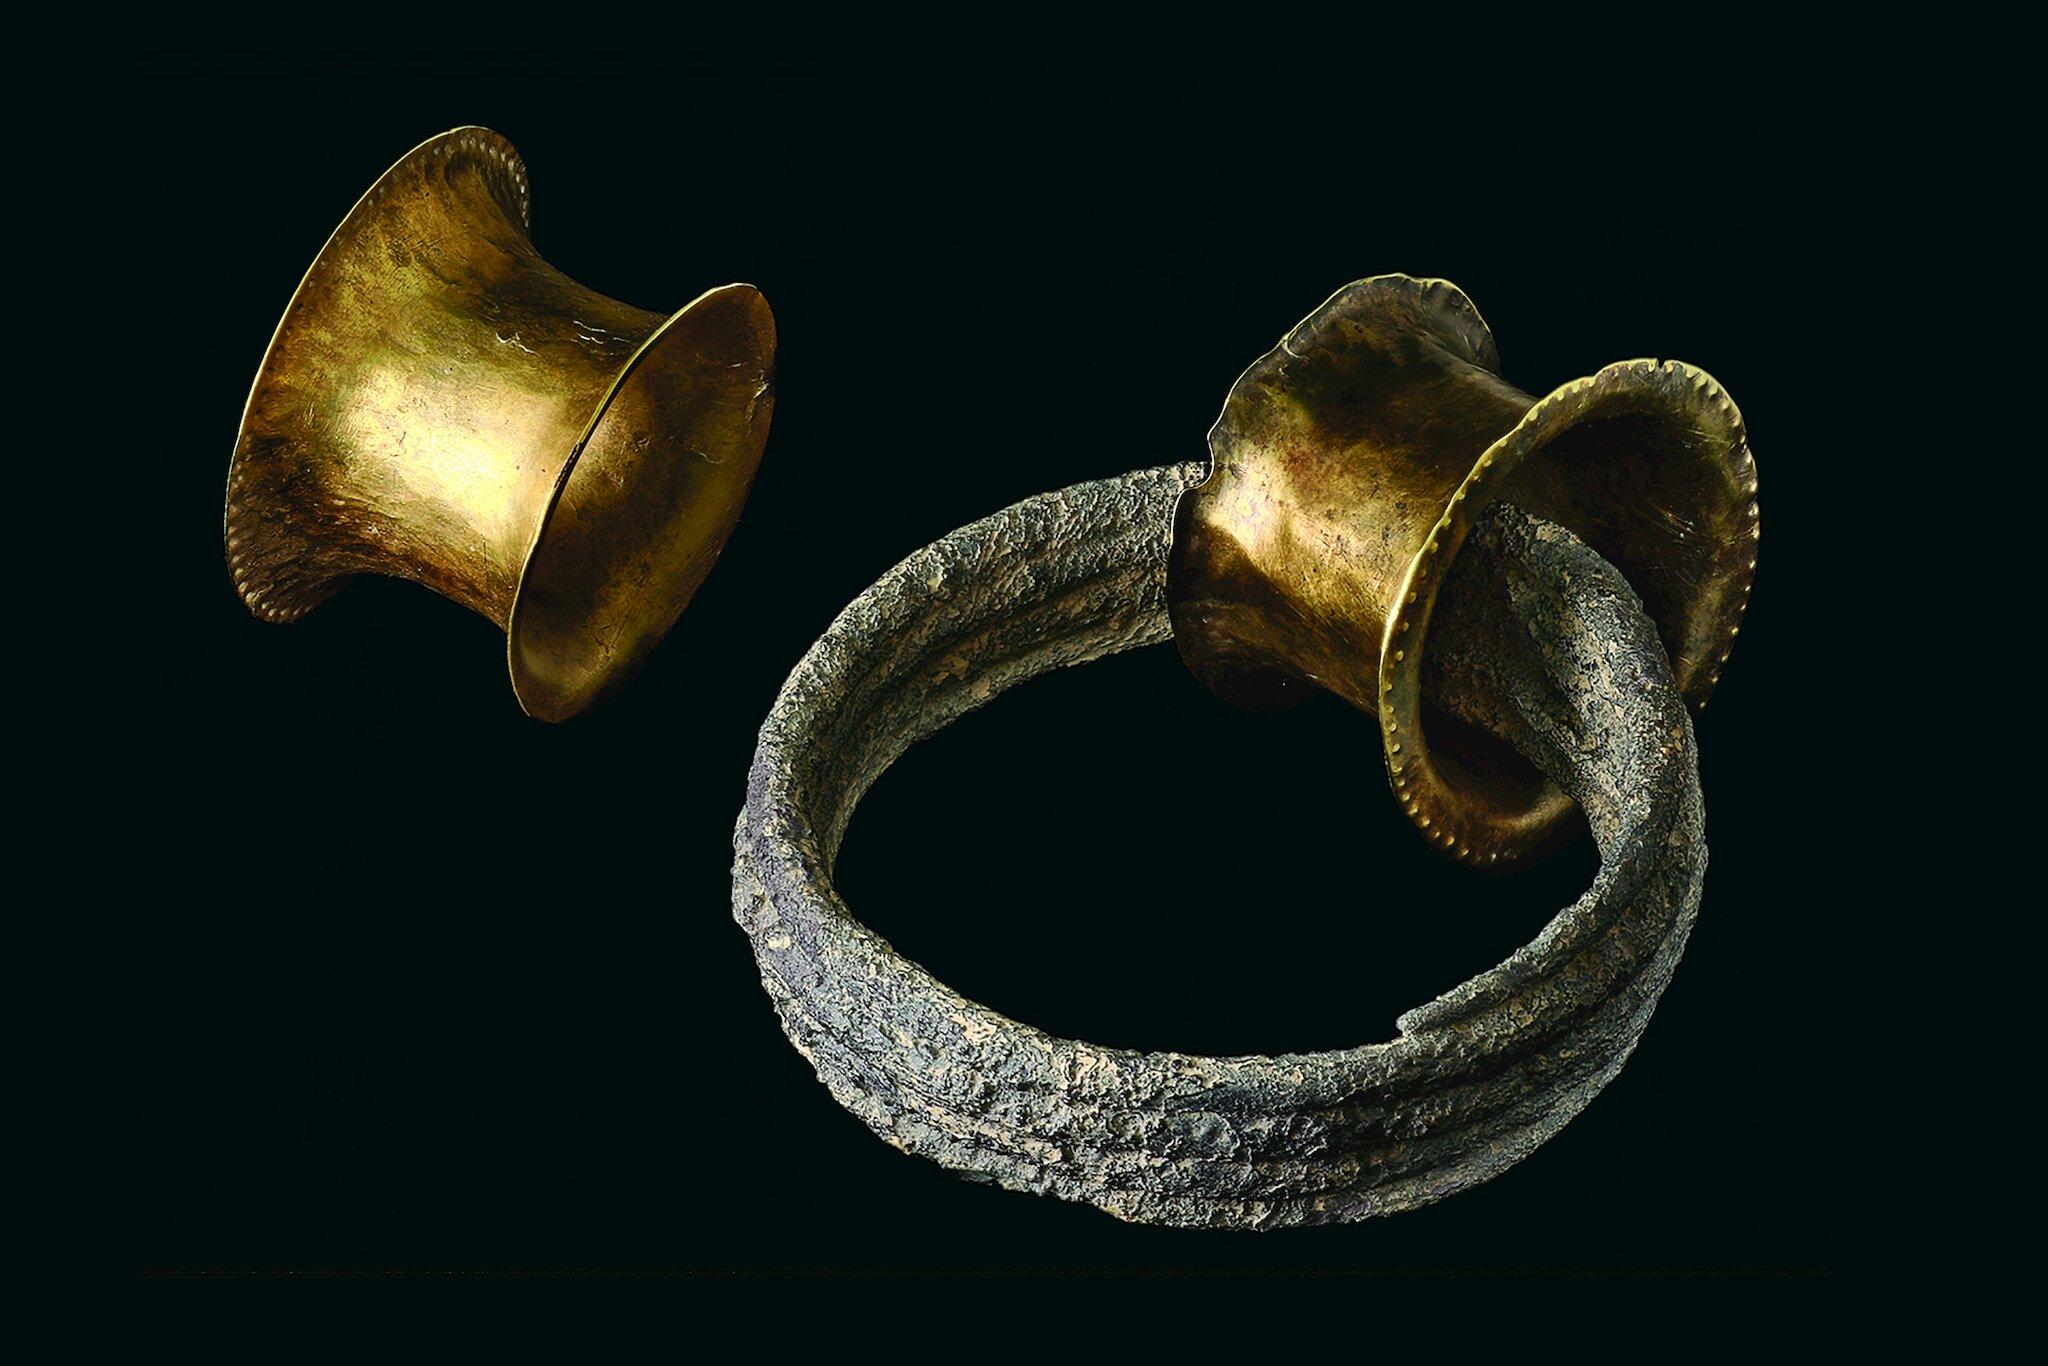 Le quote rosa del Medioevo. Clamorosa scoperta in Spagna